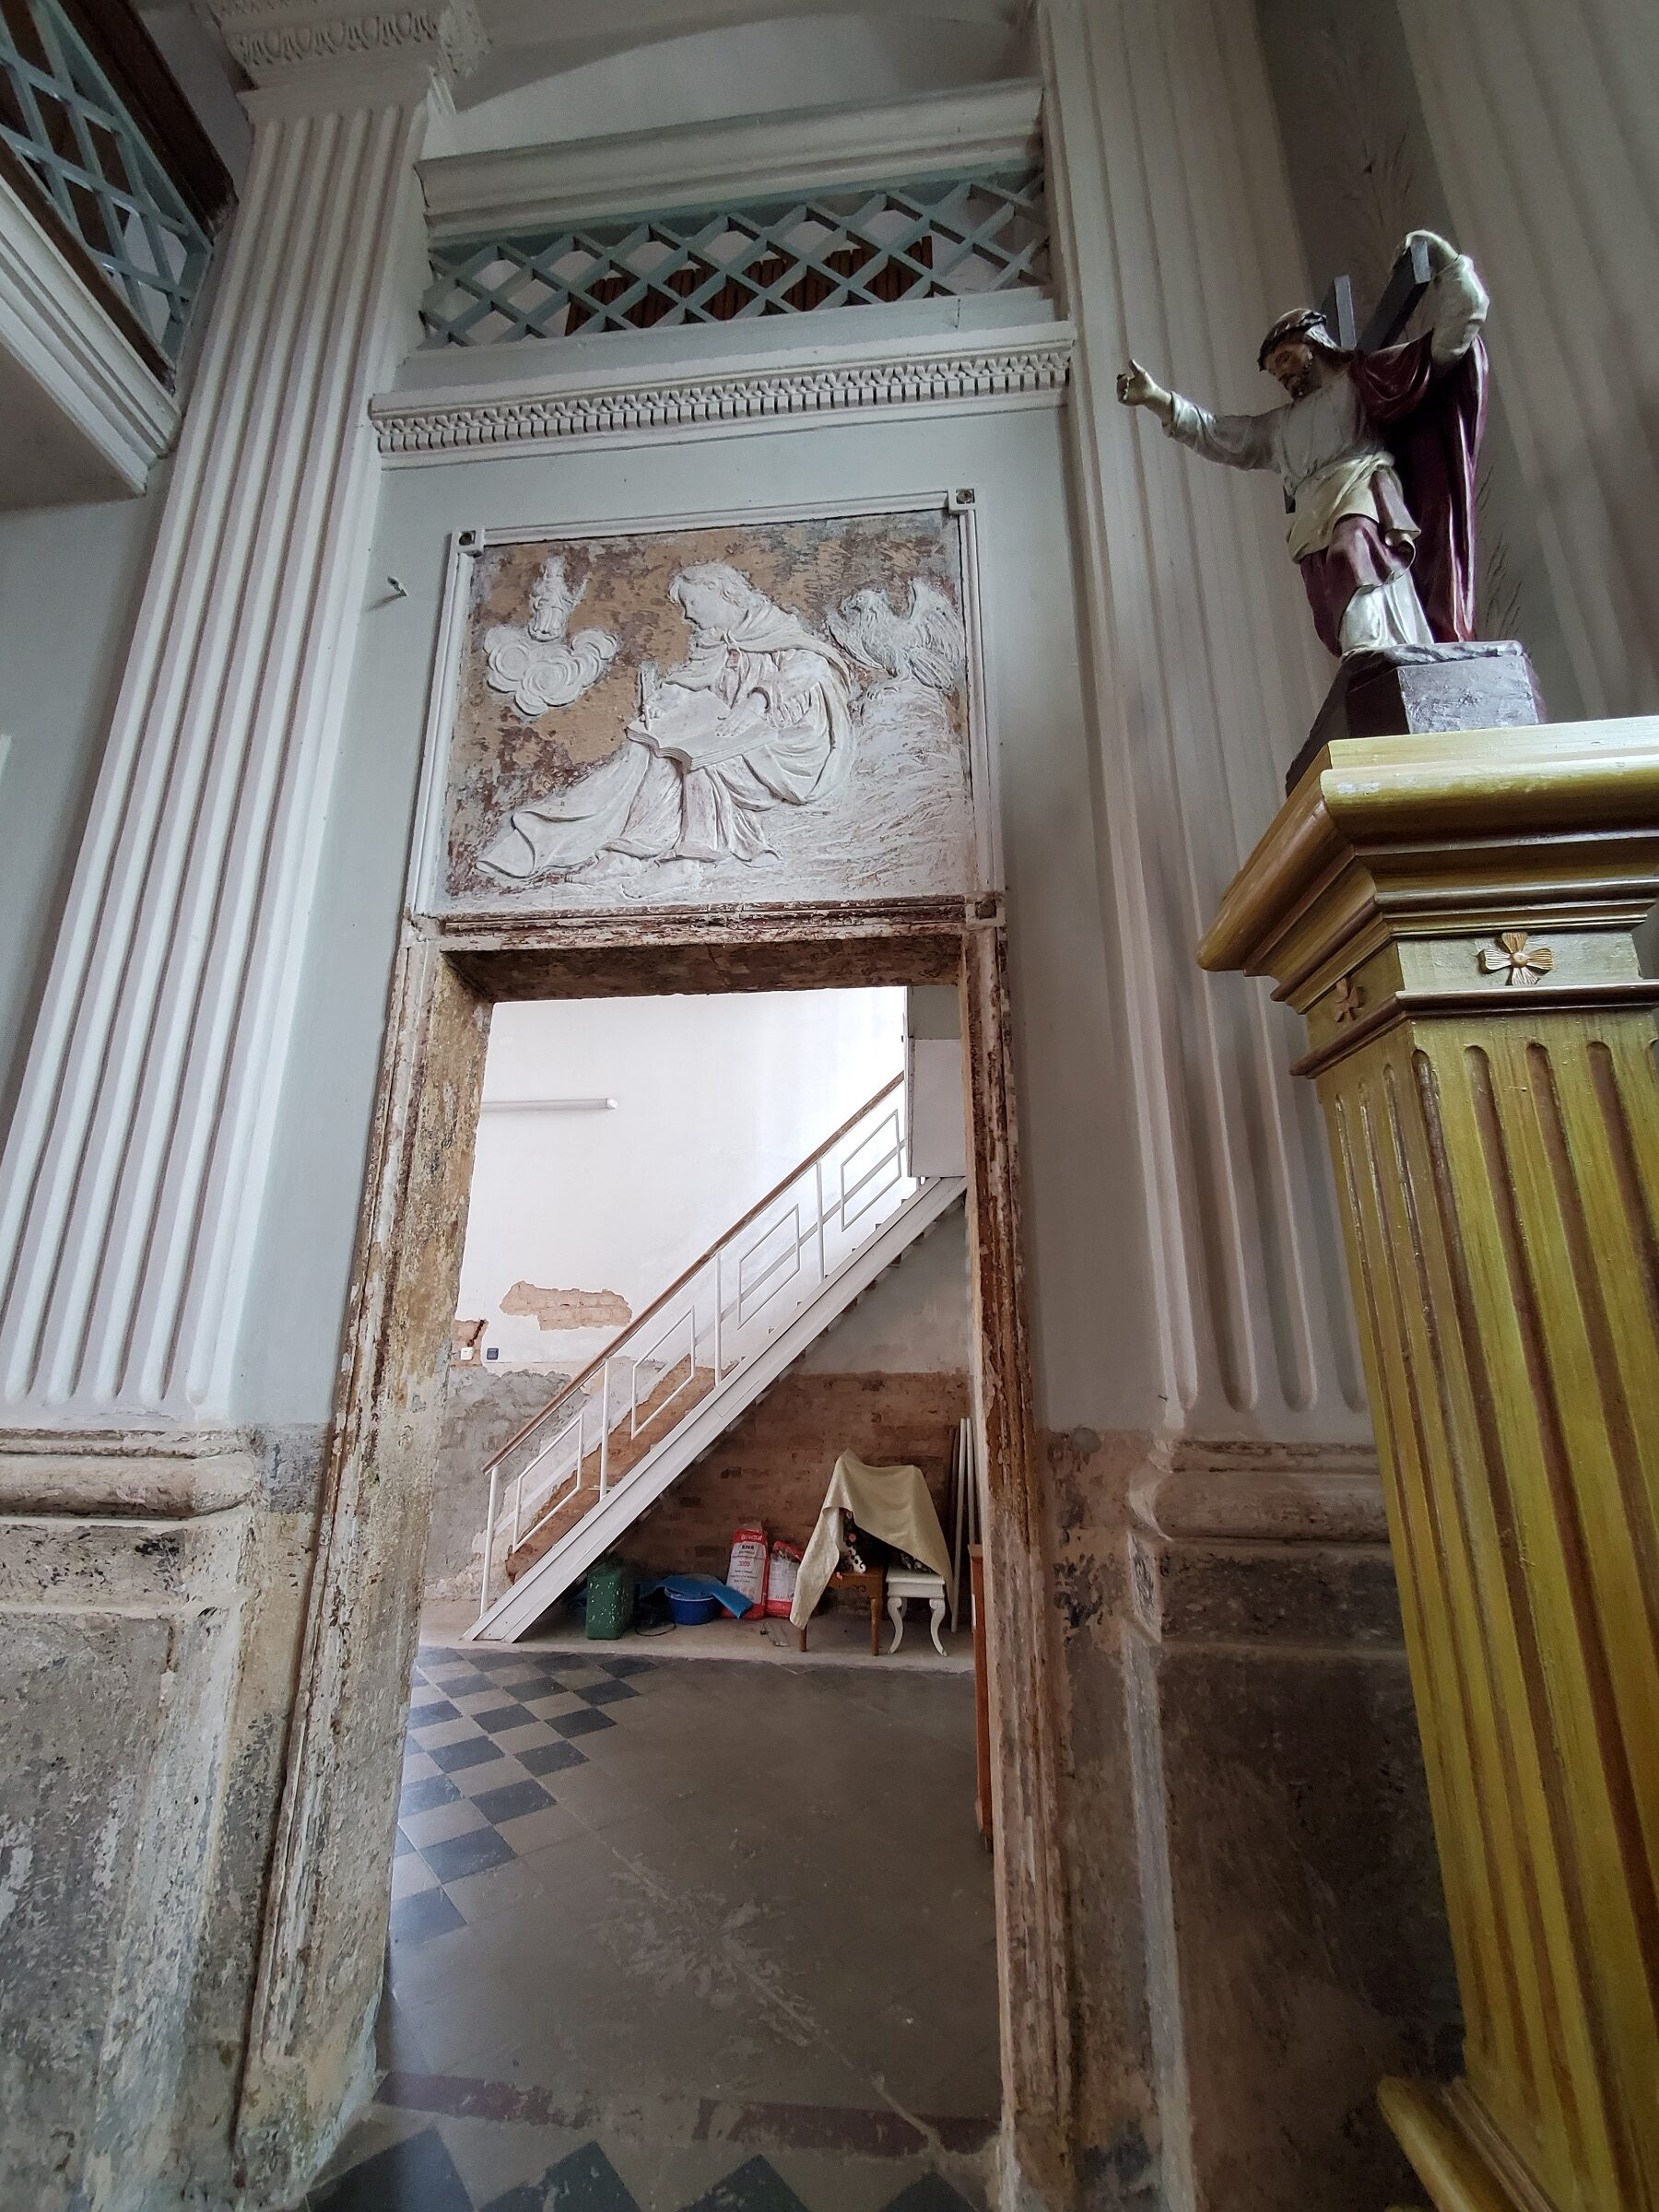 20200703 143007 rotated - Костел Святой Анны в деревне Мосар